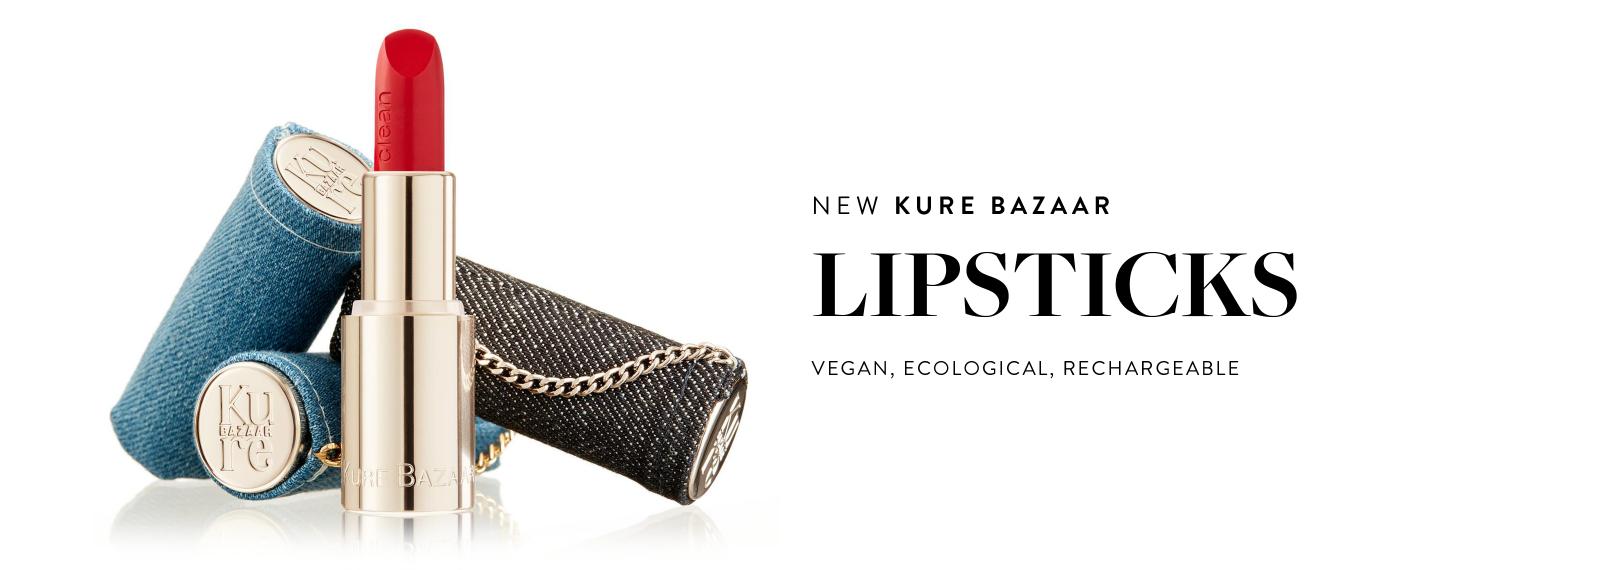 New - KURE BAZAAR - Lipsticks